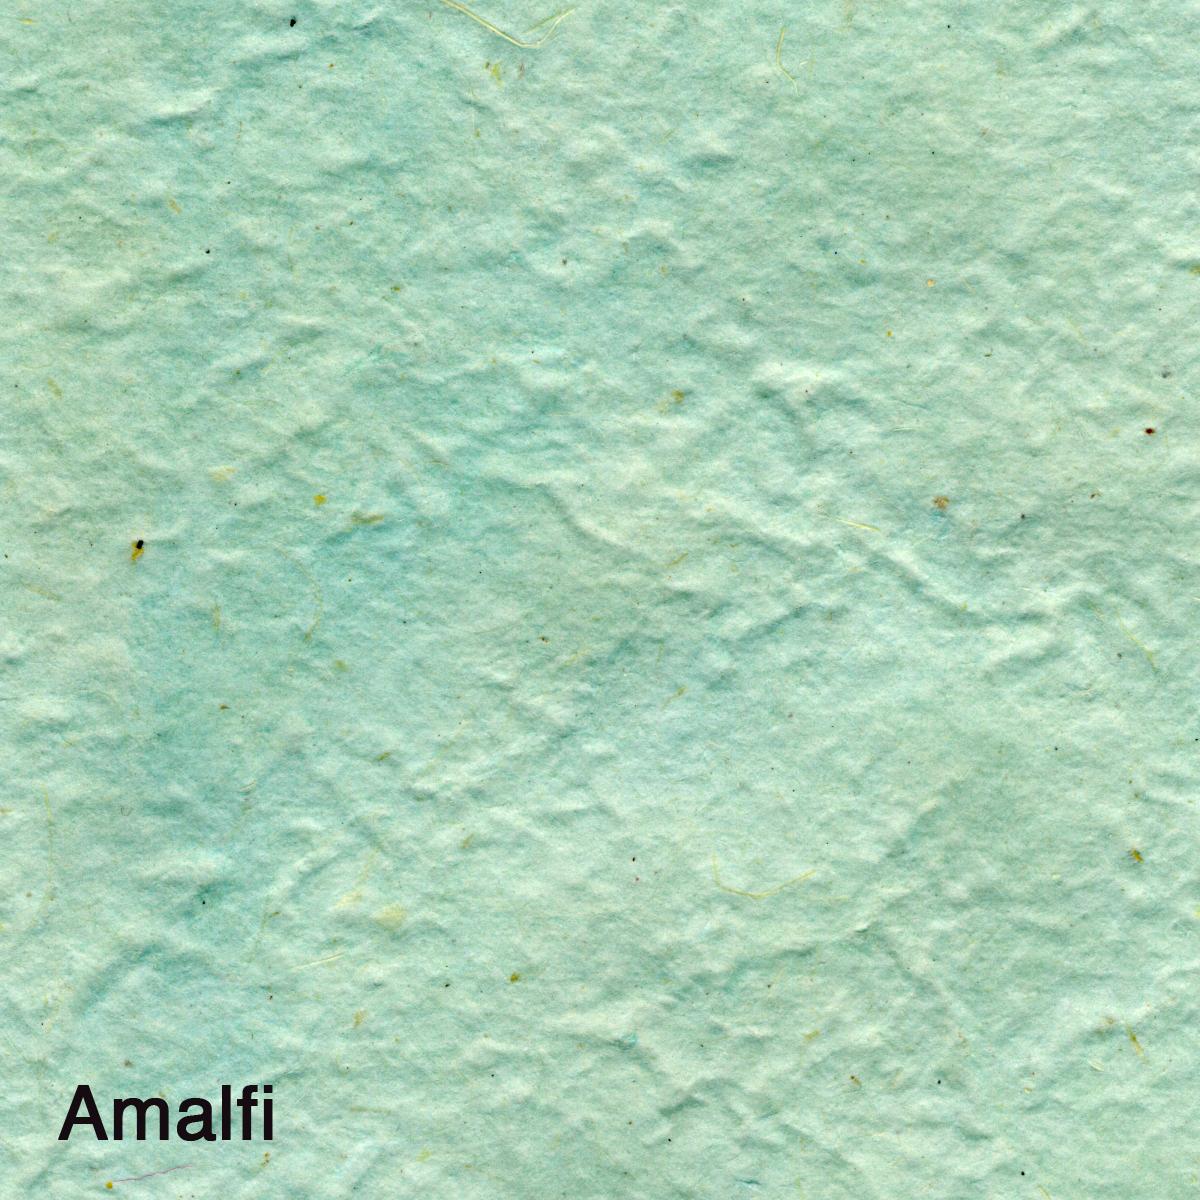 Amalfi004.jpg